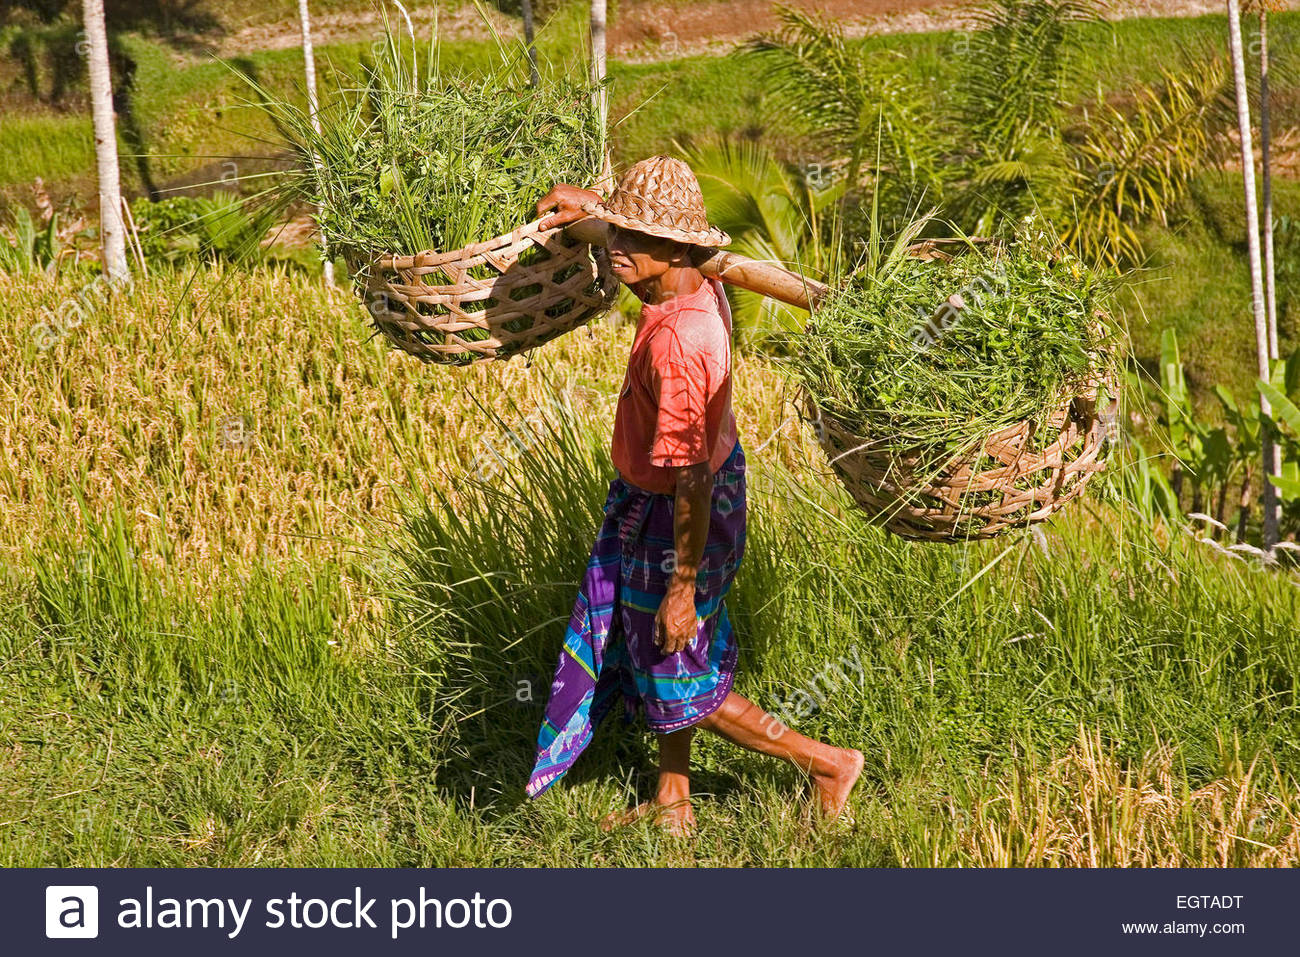 Tegalalang rice terraces, Bali, Indonesia - Stock Image